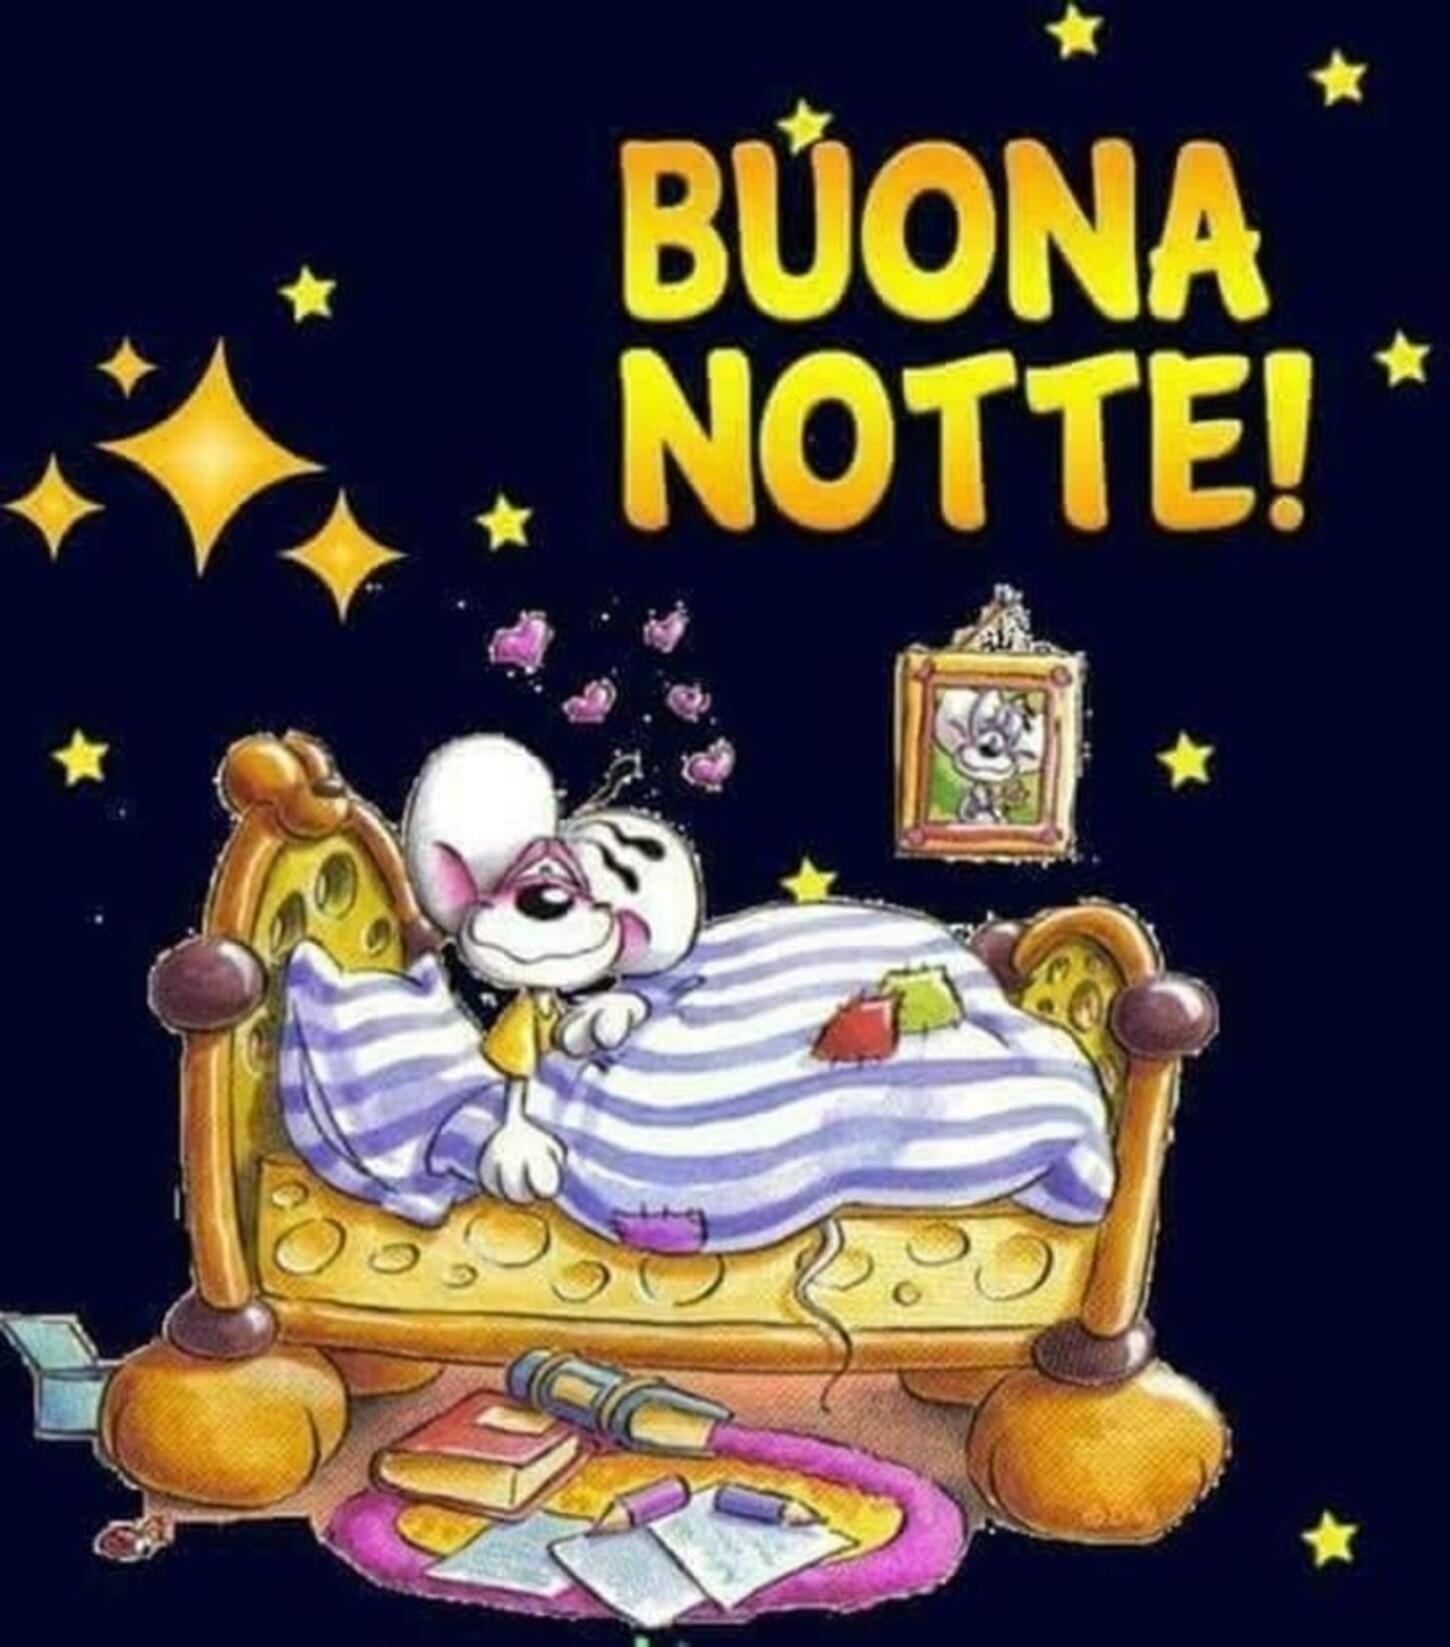 Buonanotte Diddle